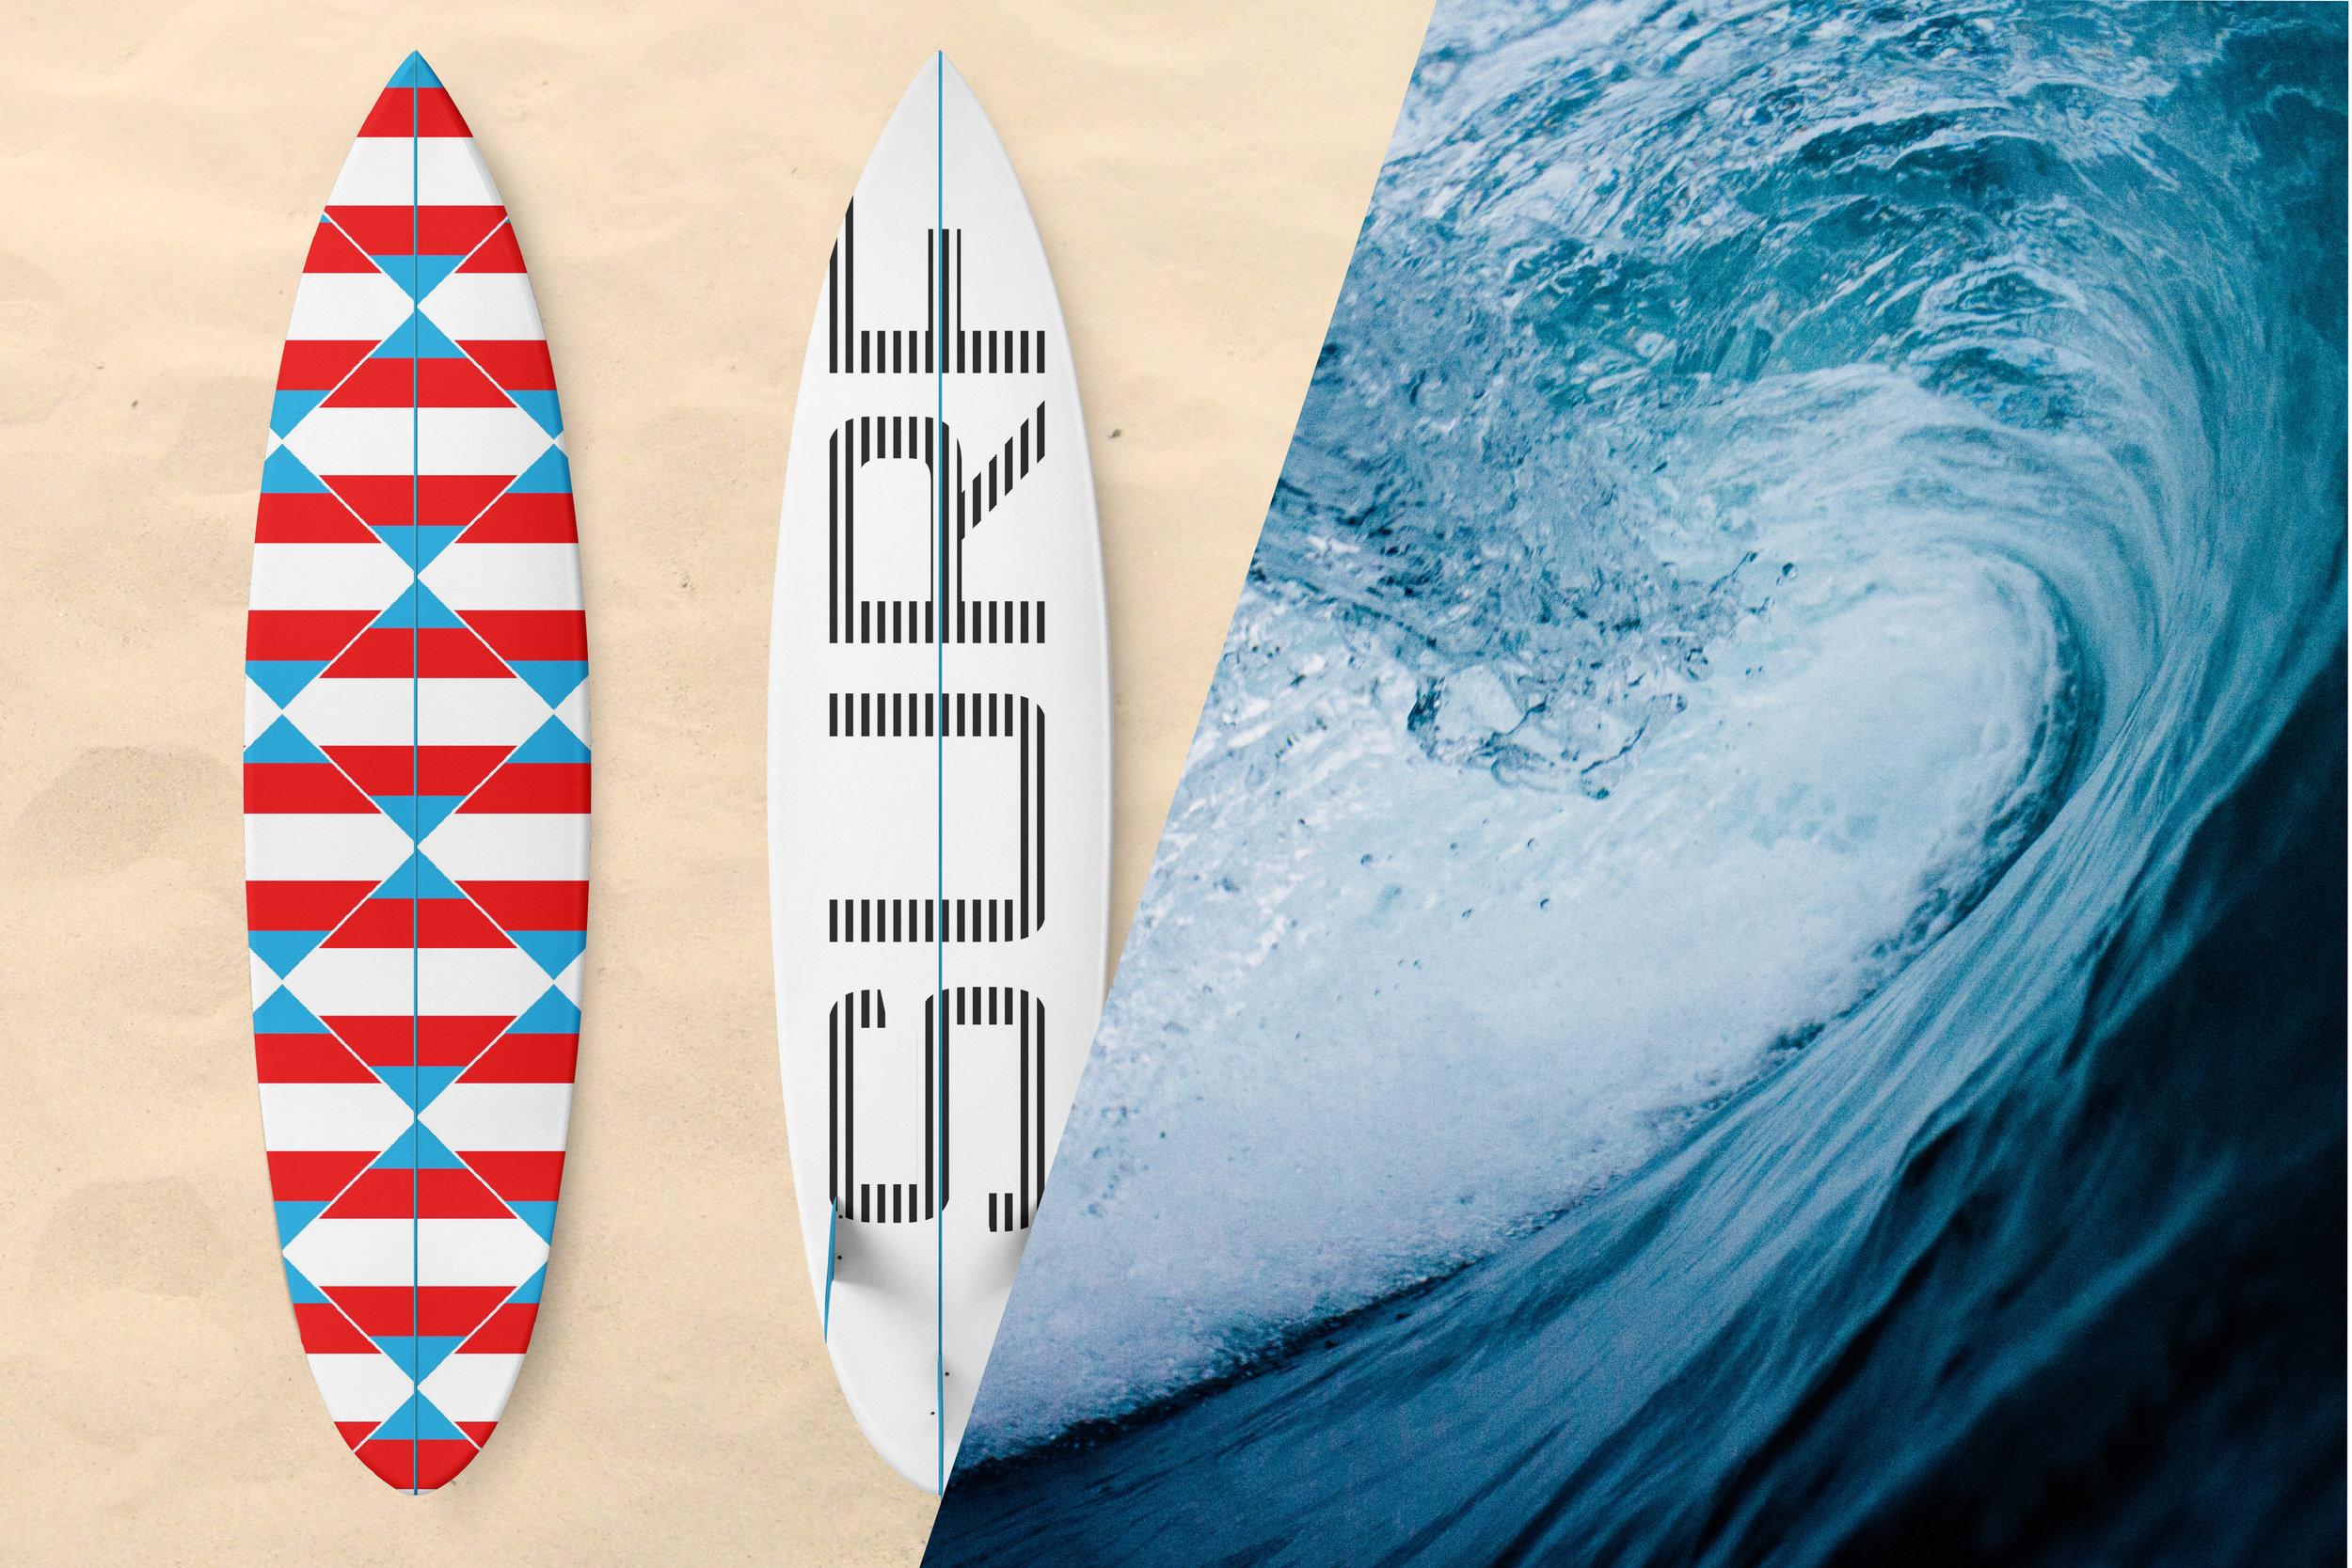 Zen Geo designs by Chris Olson. Surfboard art. Wave photo by  Tim Marshall on  Unsplash